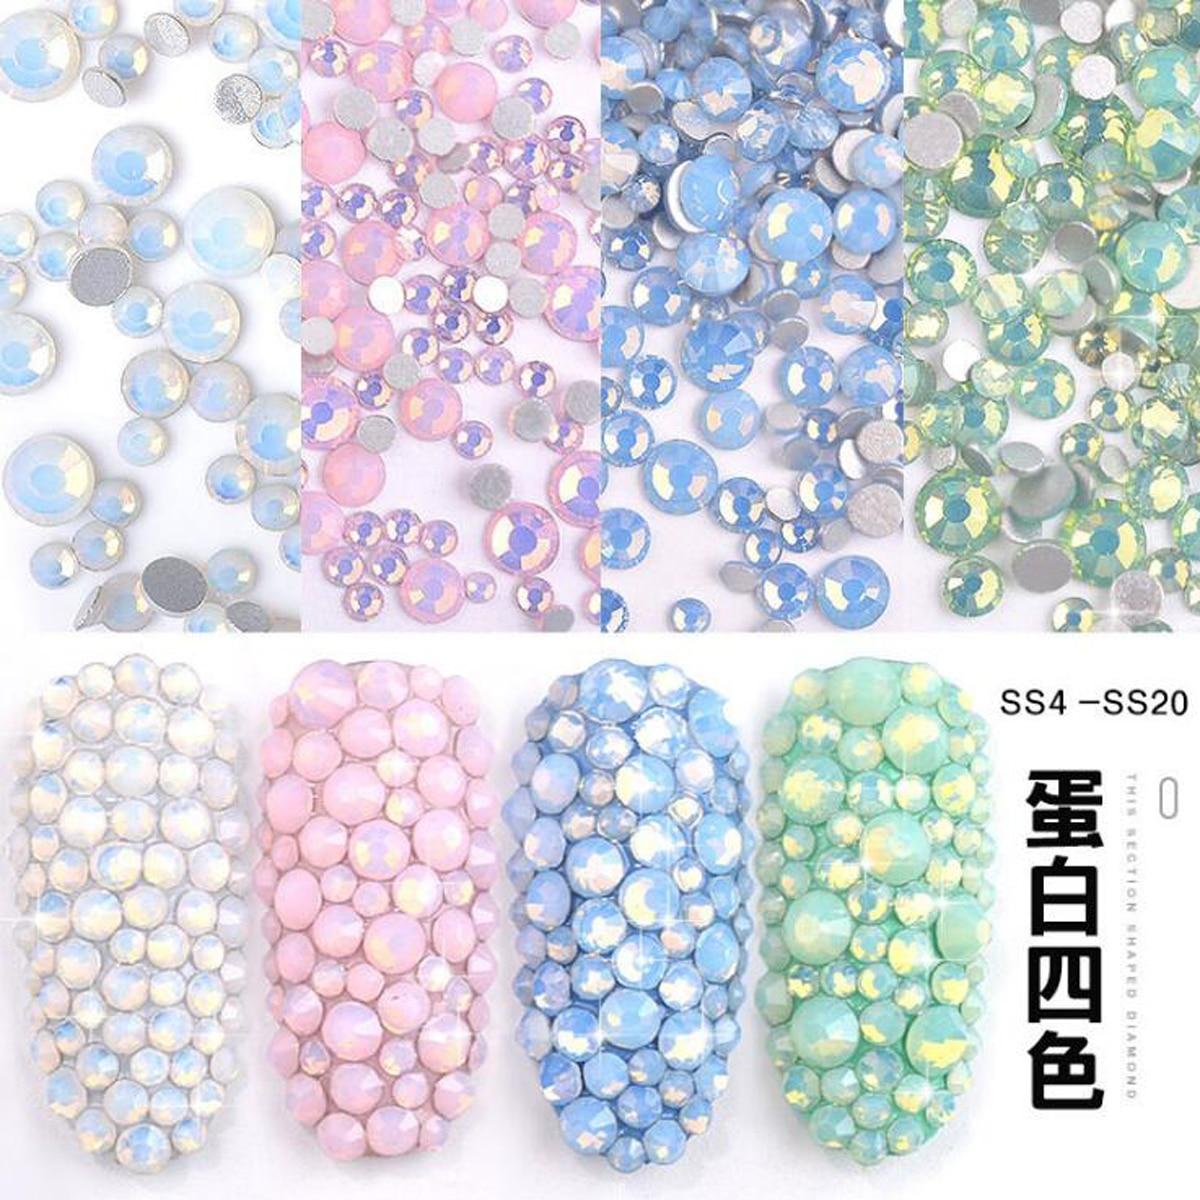 350pcs/pack 7 Sizes DIY Nail Rhinestones 3D Nail Art Decoration Snow Protein Glass Crystal Dill Diamond Manicure Ornaments